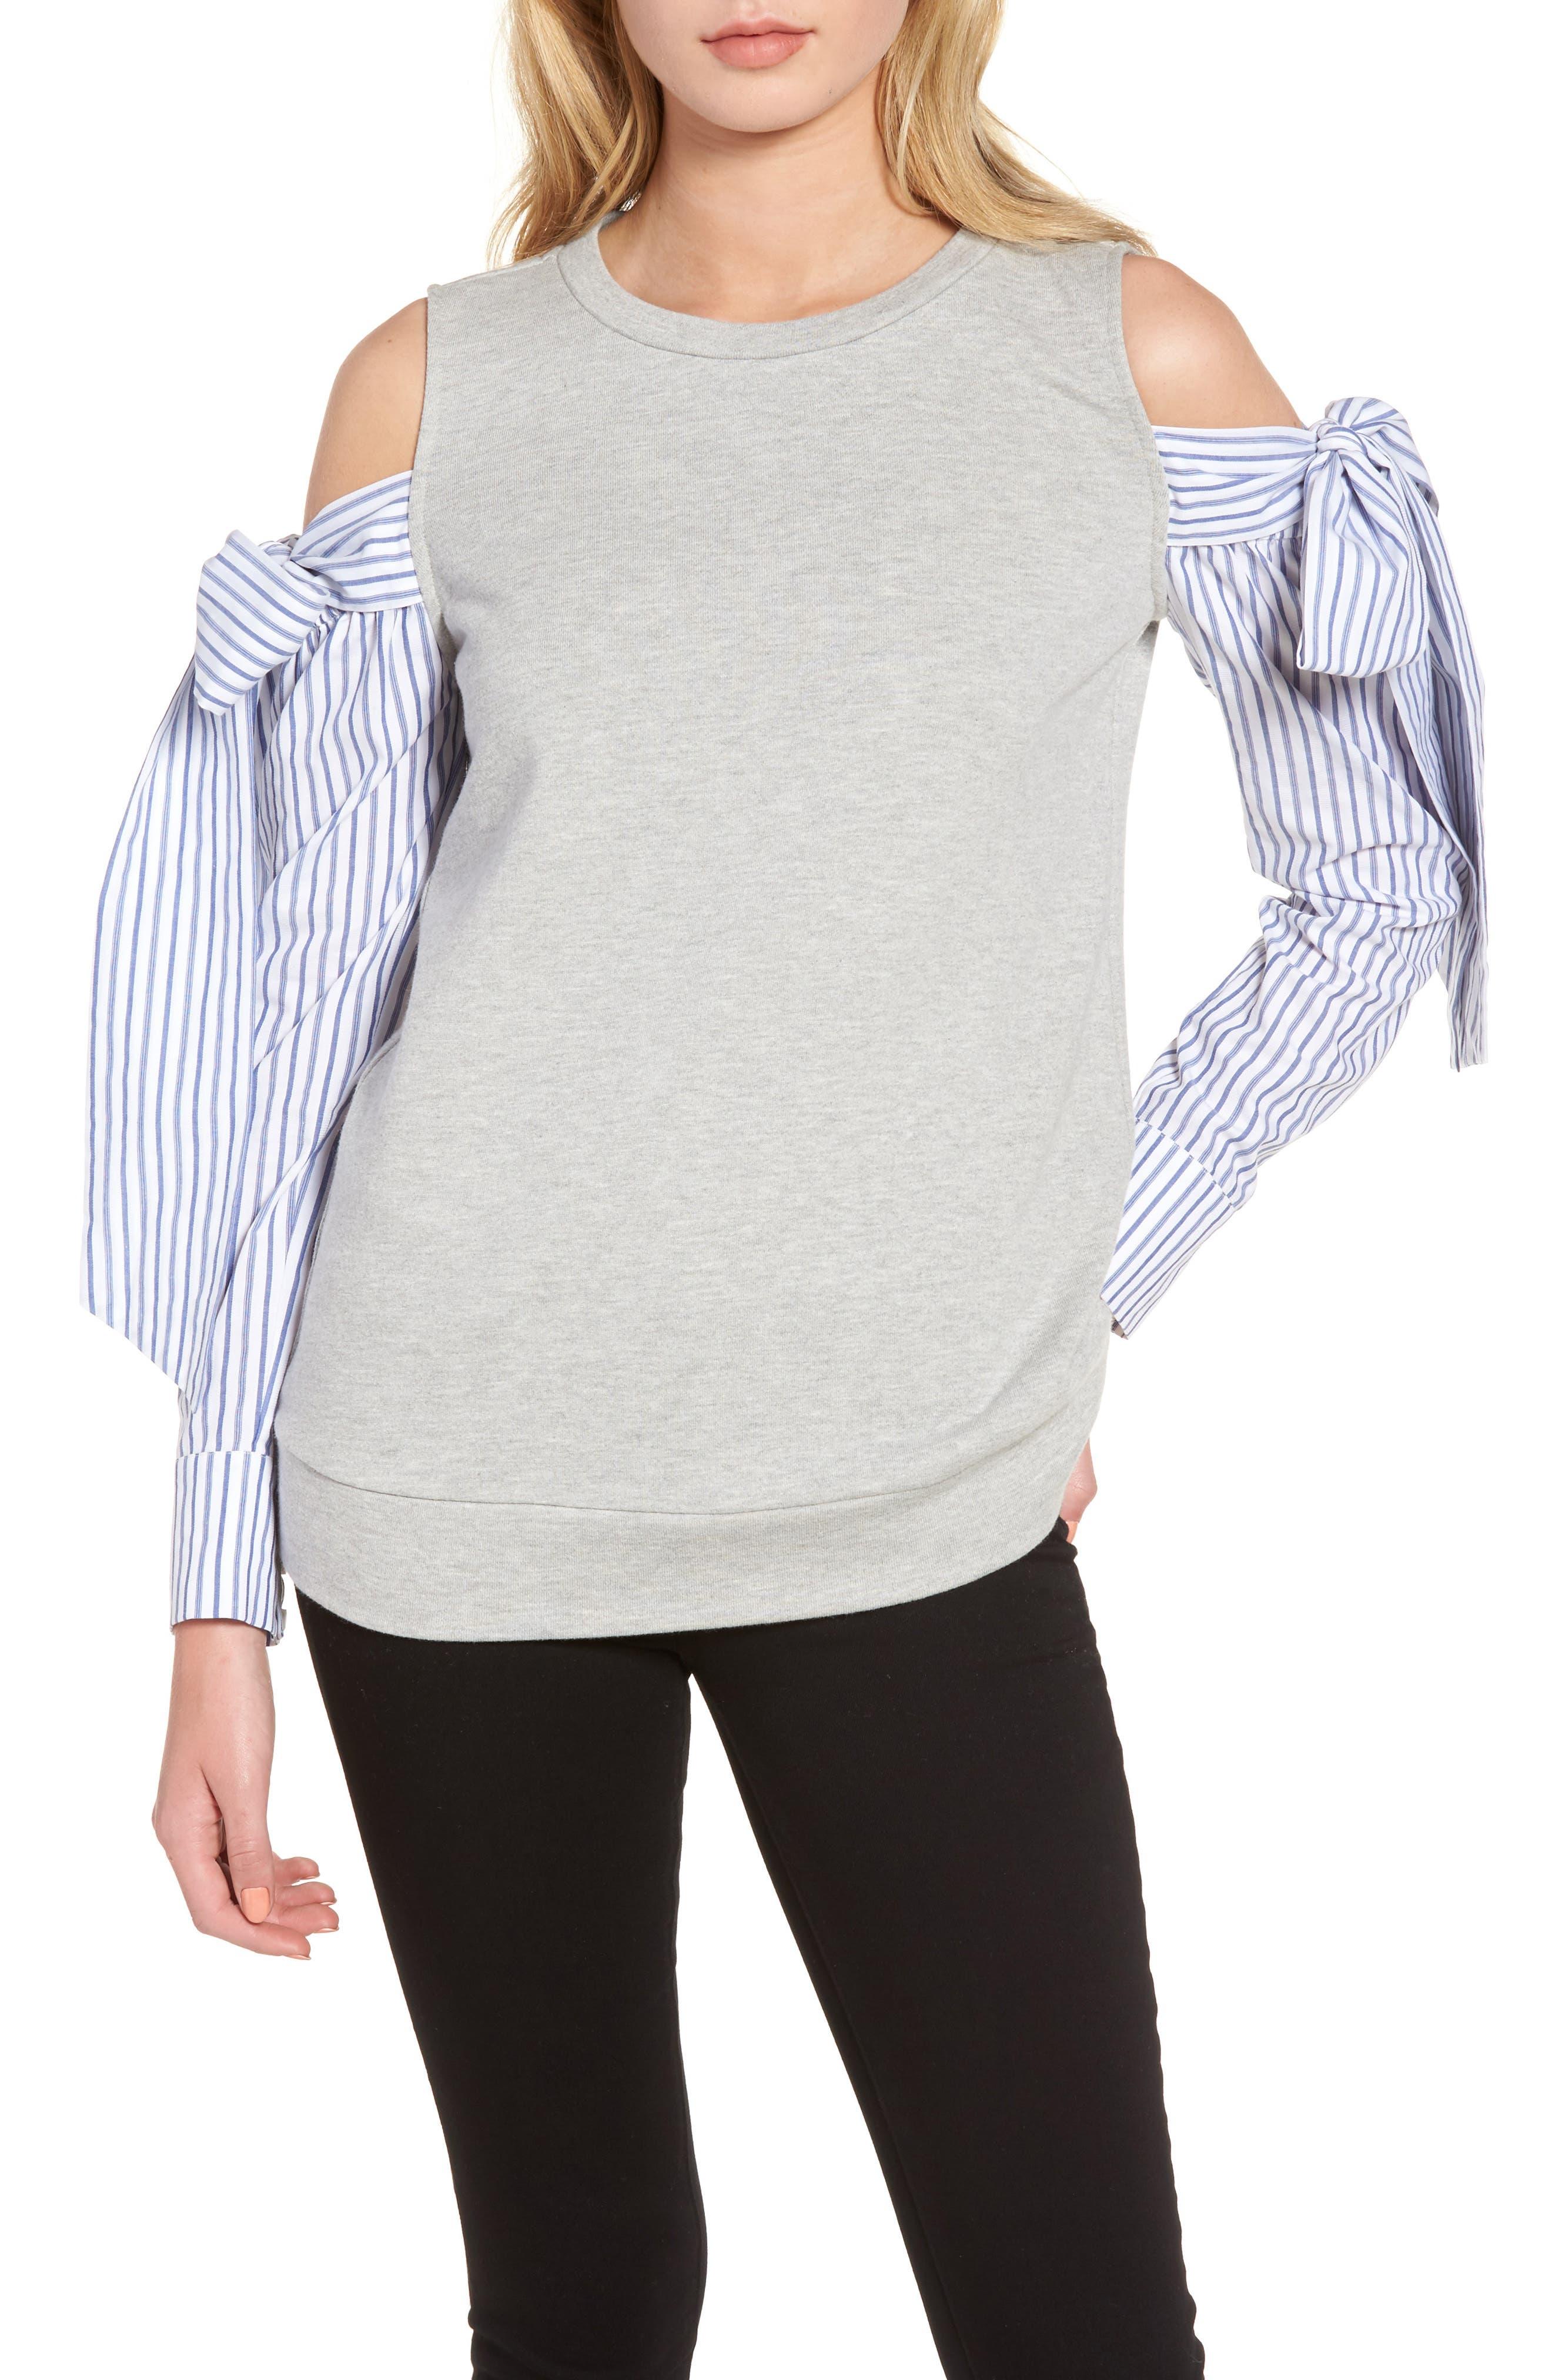 Cold Shoulder Sweatshirt,                             Main thumbnail 1, color,                             Grey Heather